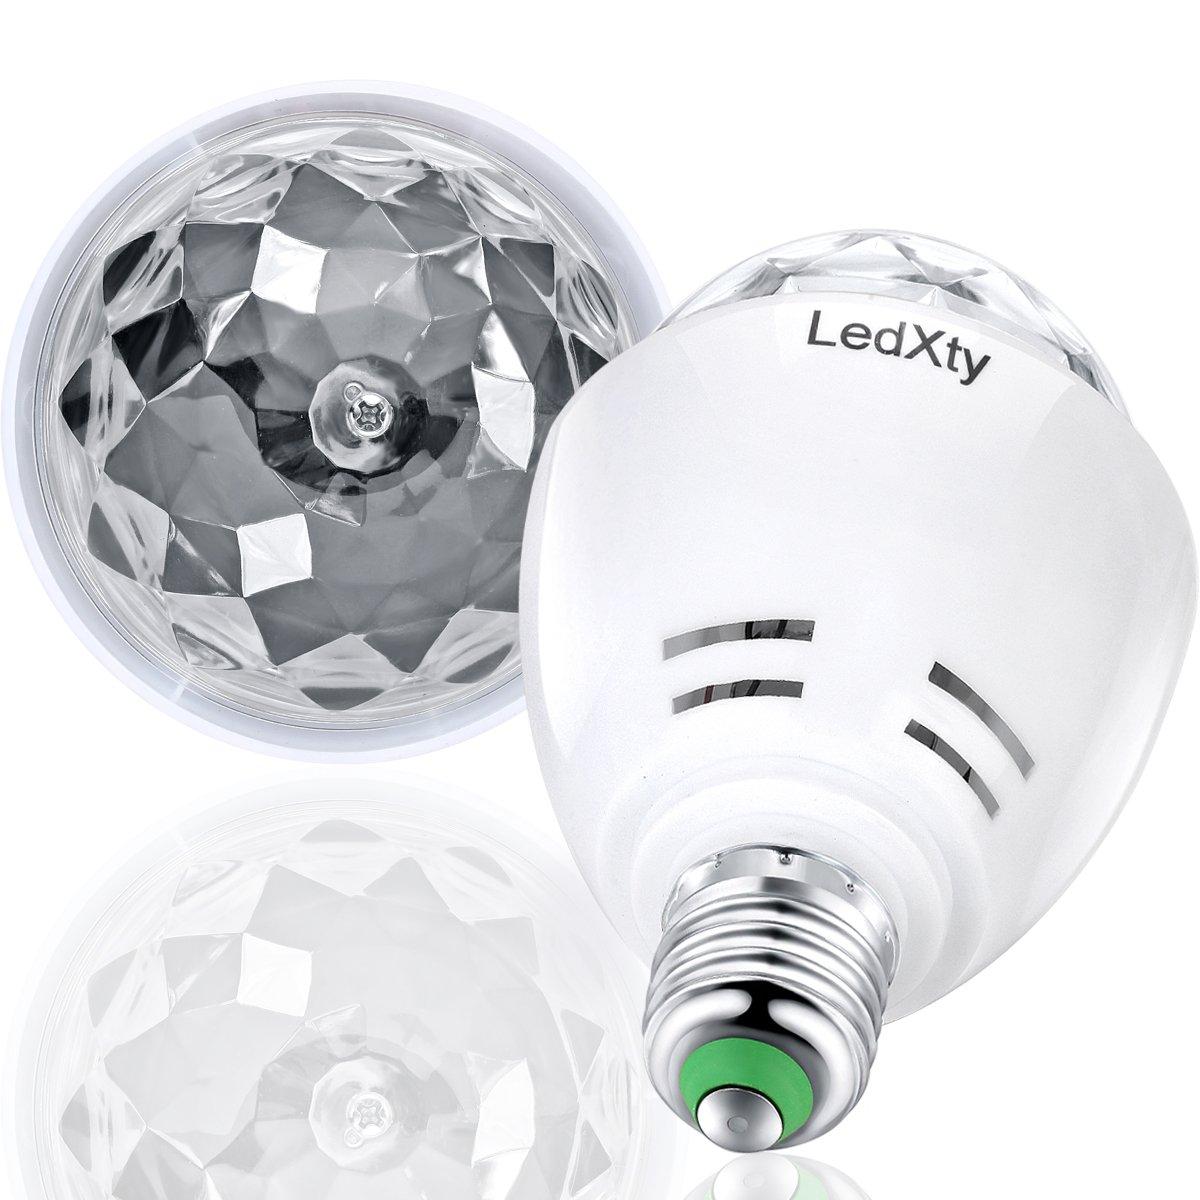 LED Blacklight Lianji E26/E27 Ultraviolet Party Bulb Stage Light -Rotating DJ KTV Party Pub Club Ball 3W 390nm Wavelenght LED UV Stage Light